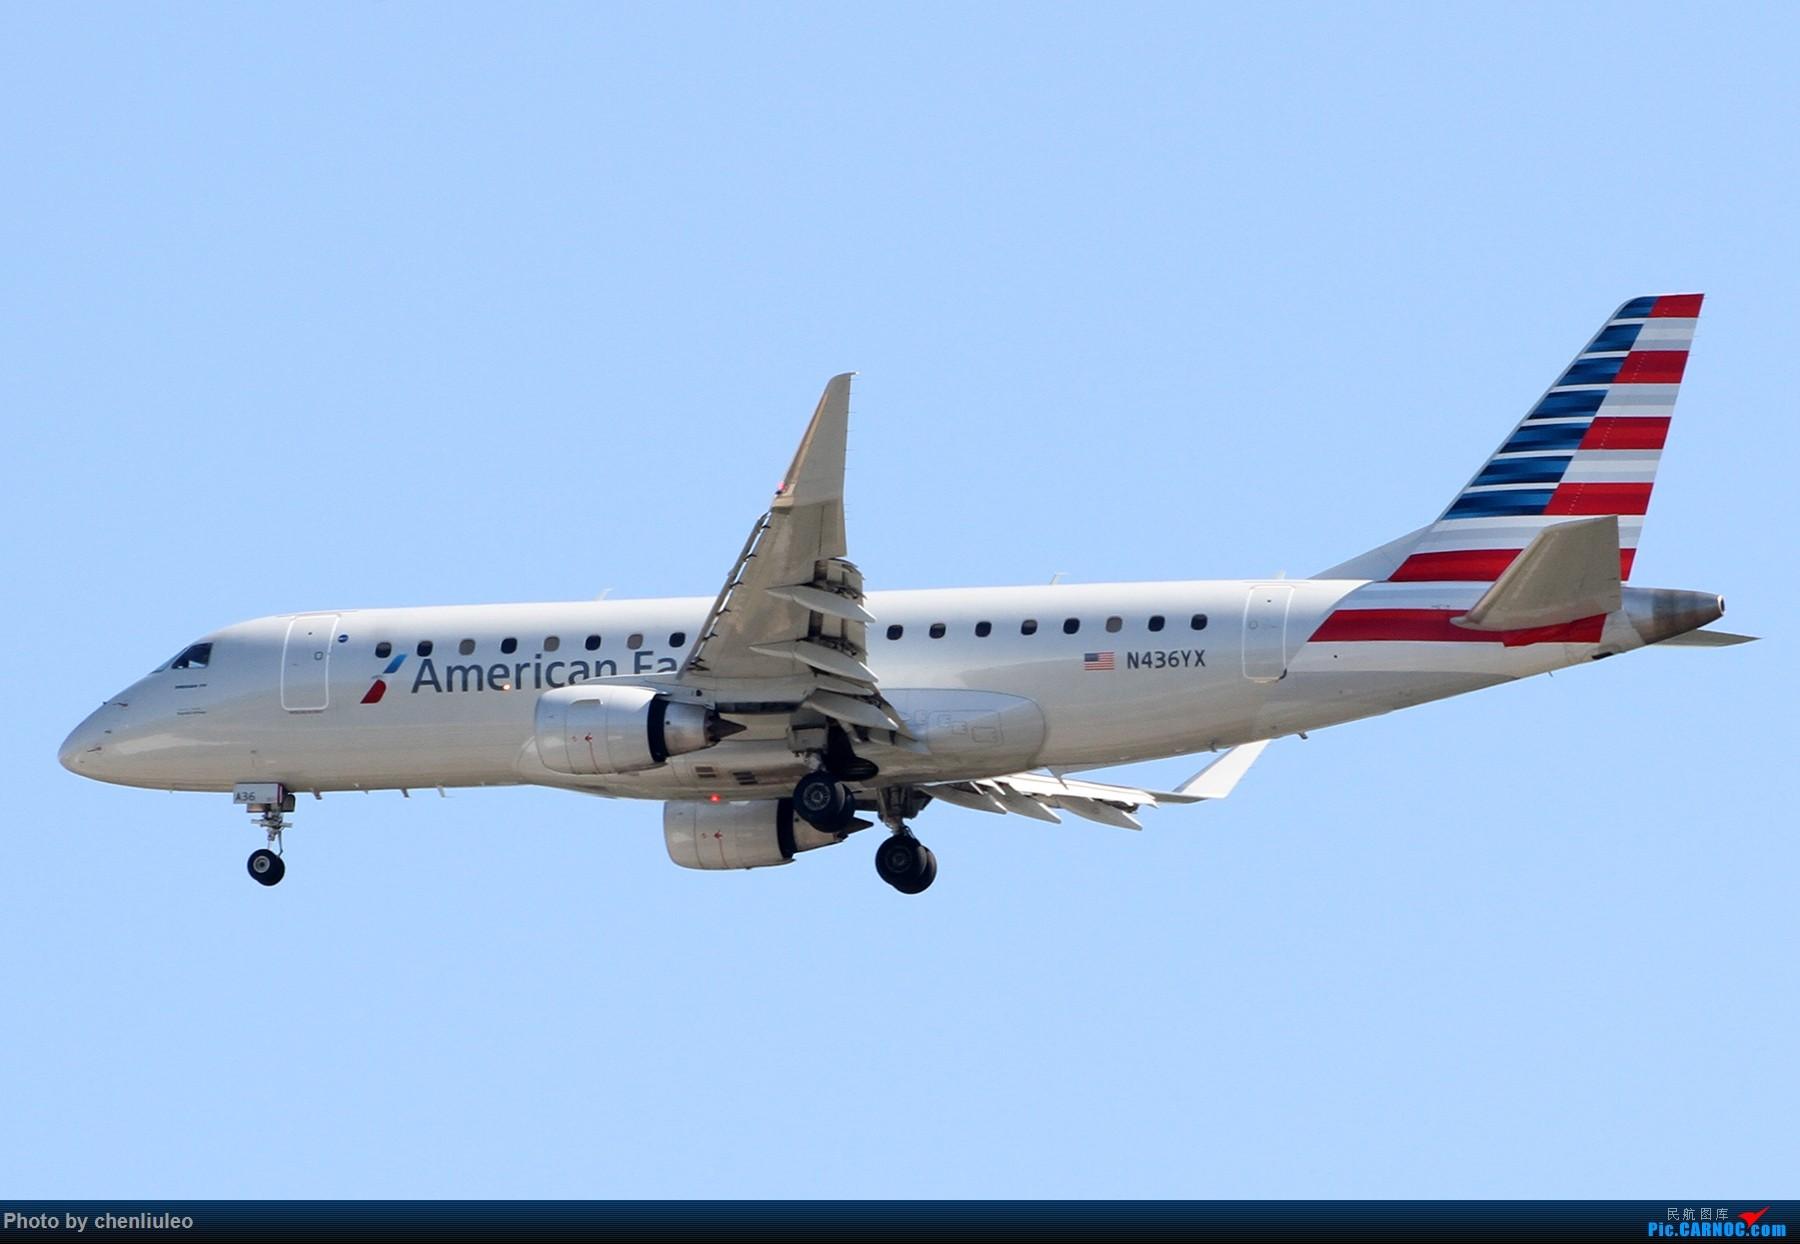 Re:[原创]【北美飞友会】本来是去等西南航空的新加州一号彩绘 结果有意外惊喜 美军C-40C EMBRAER E175 N436YX 美国圣路易斯机场